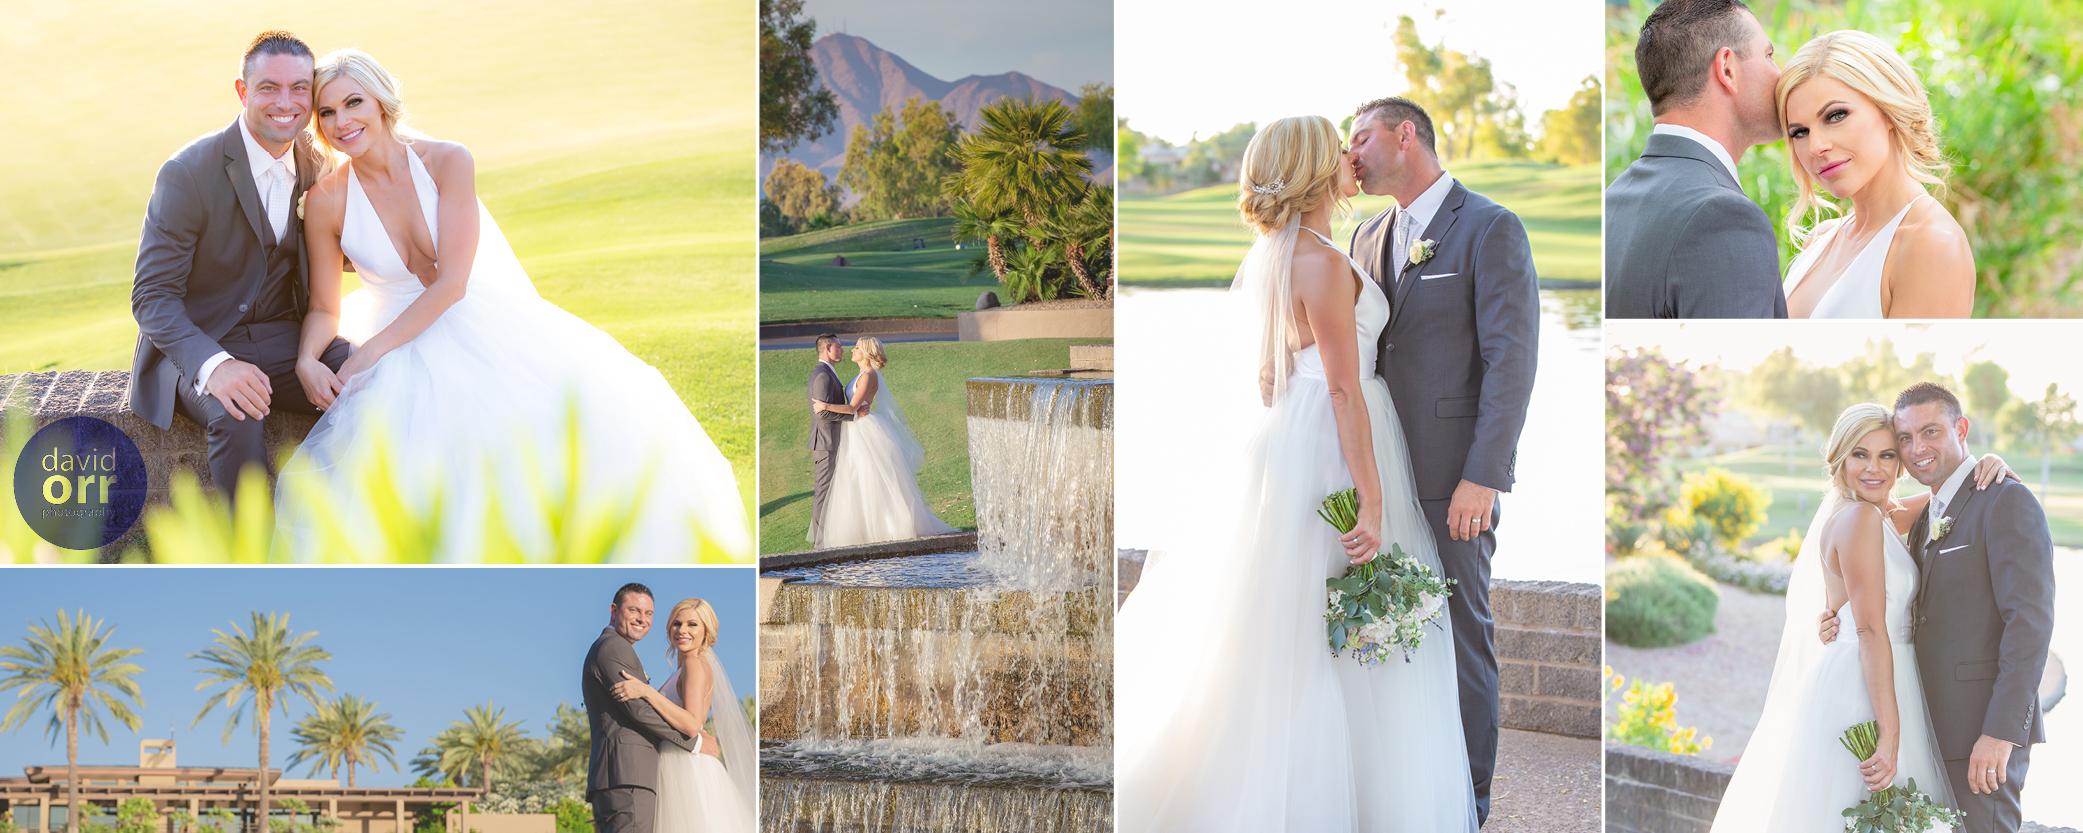 DavidOrrPhotography_Gainey-Ranch-Golf-Club-Wedding.jpg